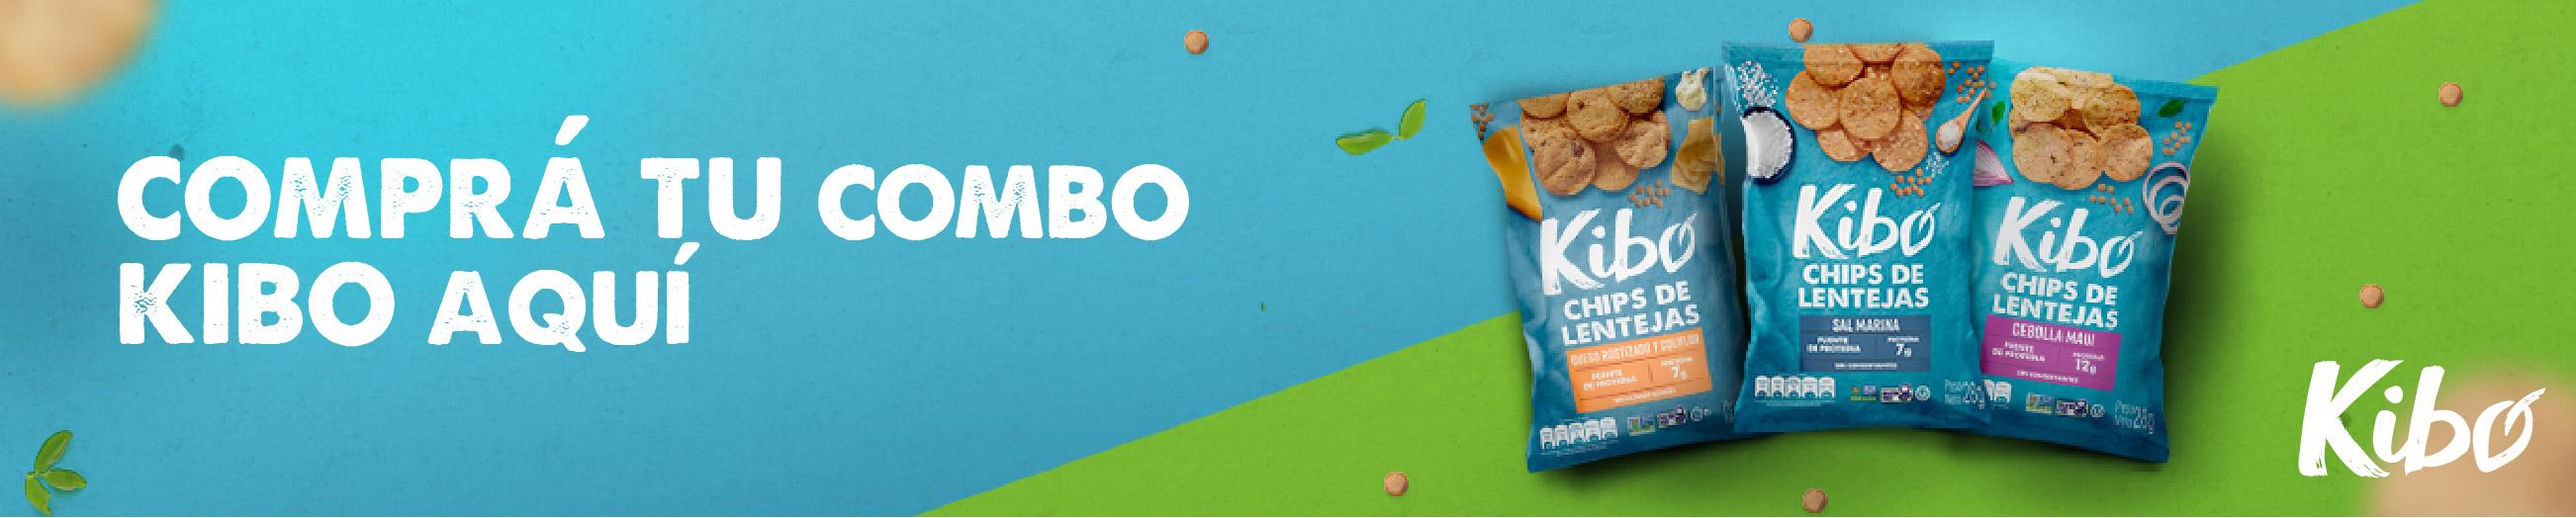 KIBO_Banners-16-13